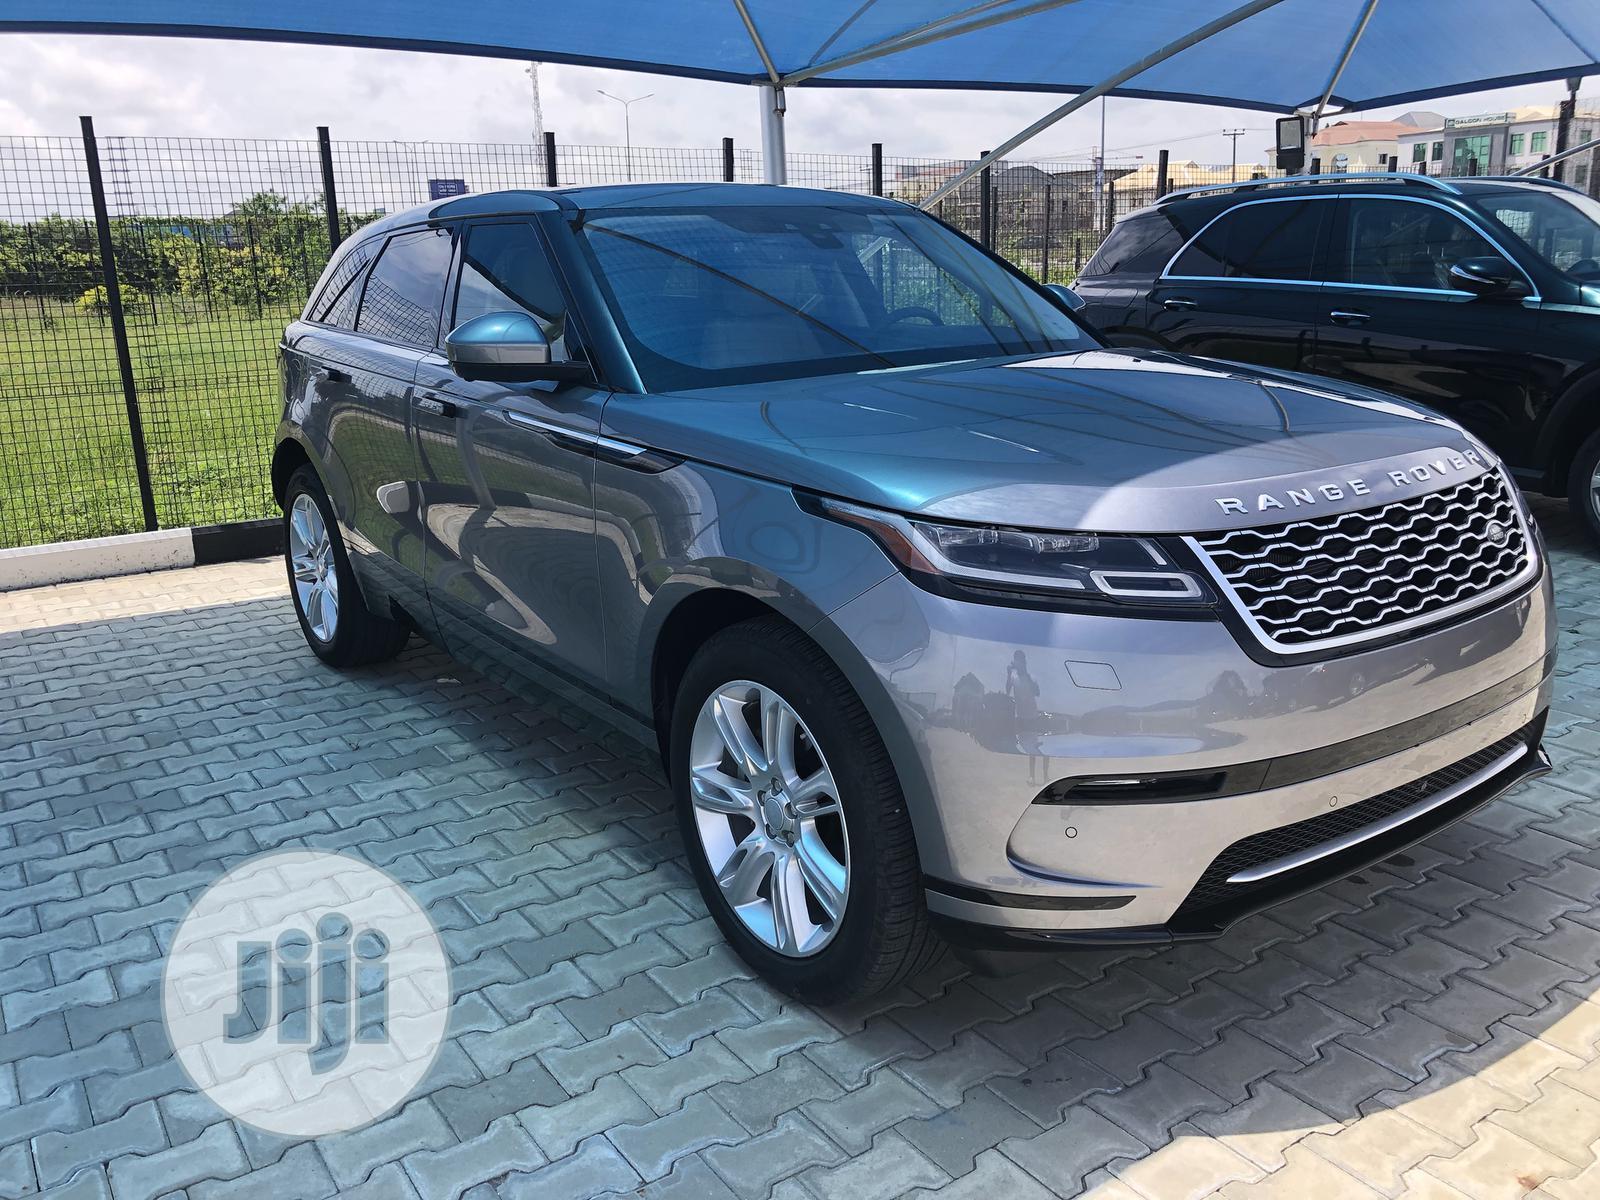 Land Rover Range Rover Velar 2020 P250 S 4x4 Gray | Cars for sale in Lekki, Lagos State, Nigeria